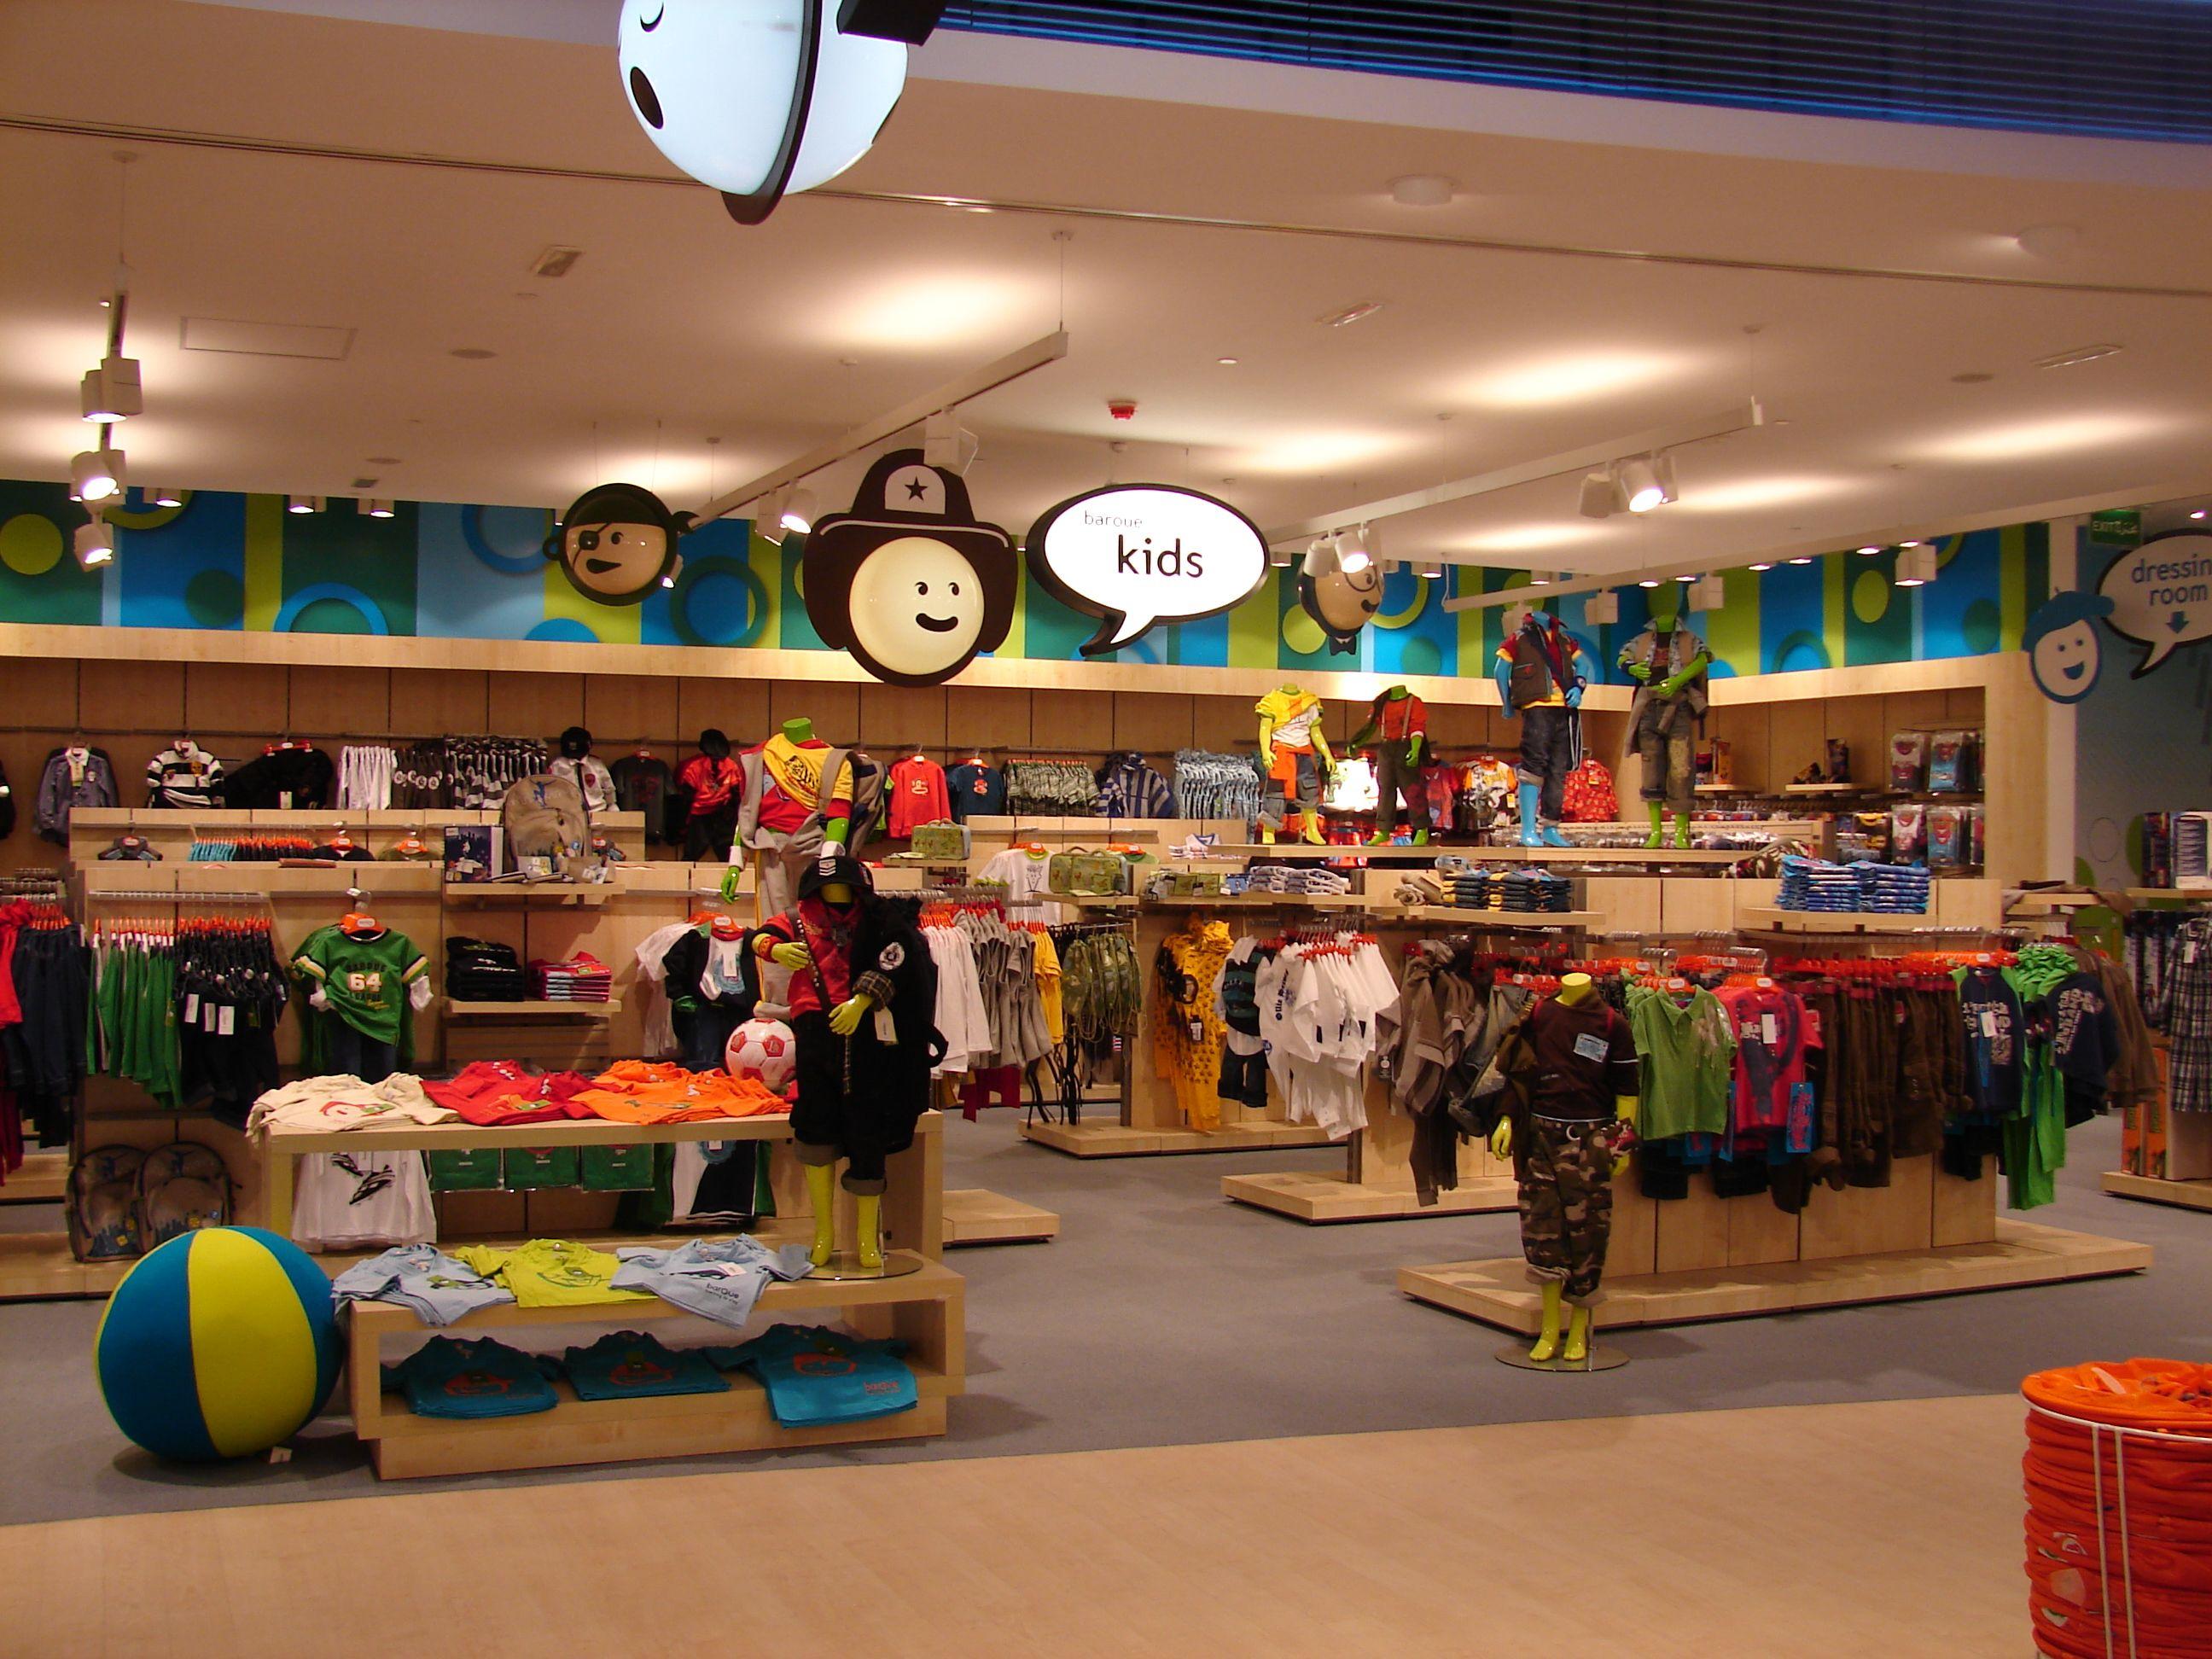 Baroue Kuwait Kids Retail Colourful Upmarket Layout